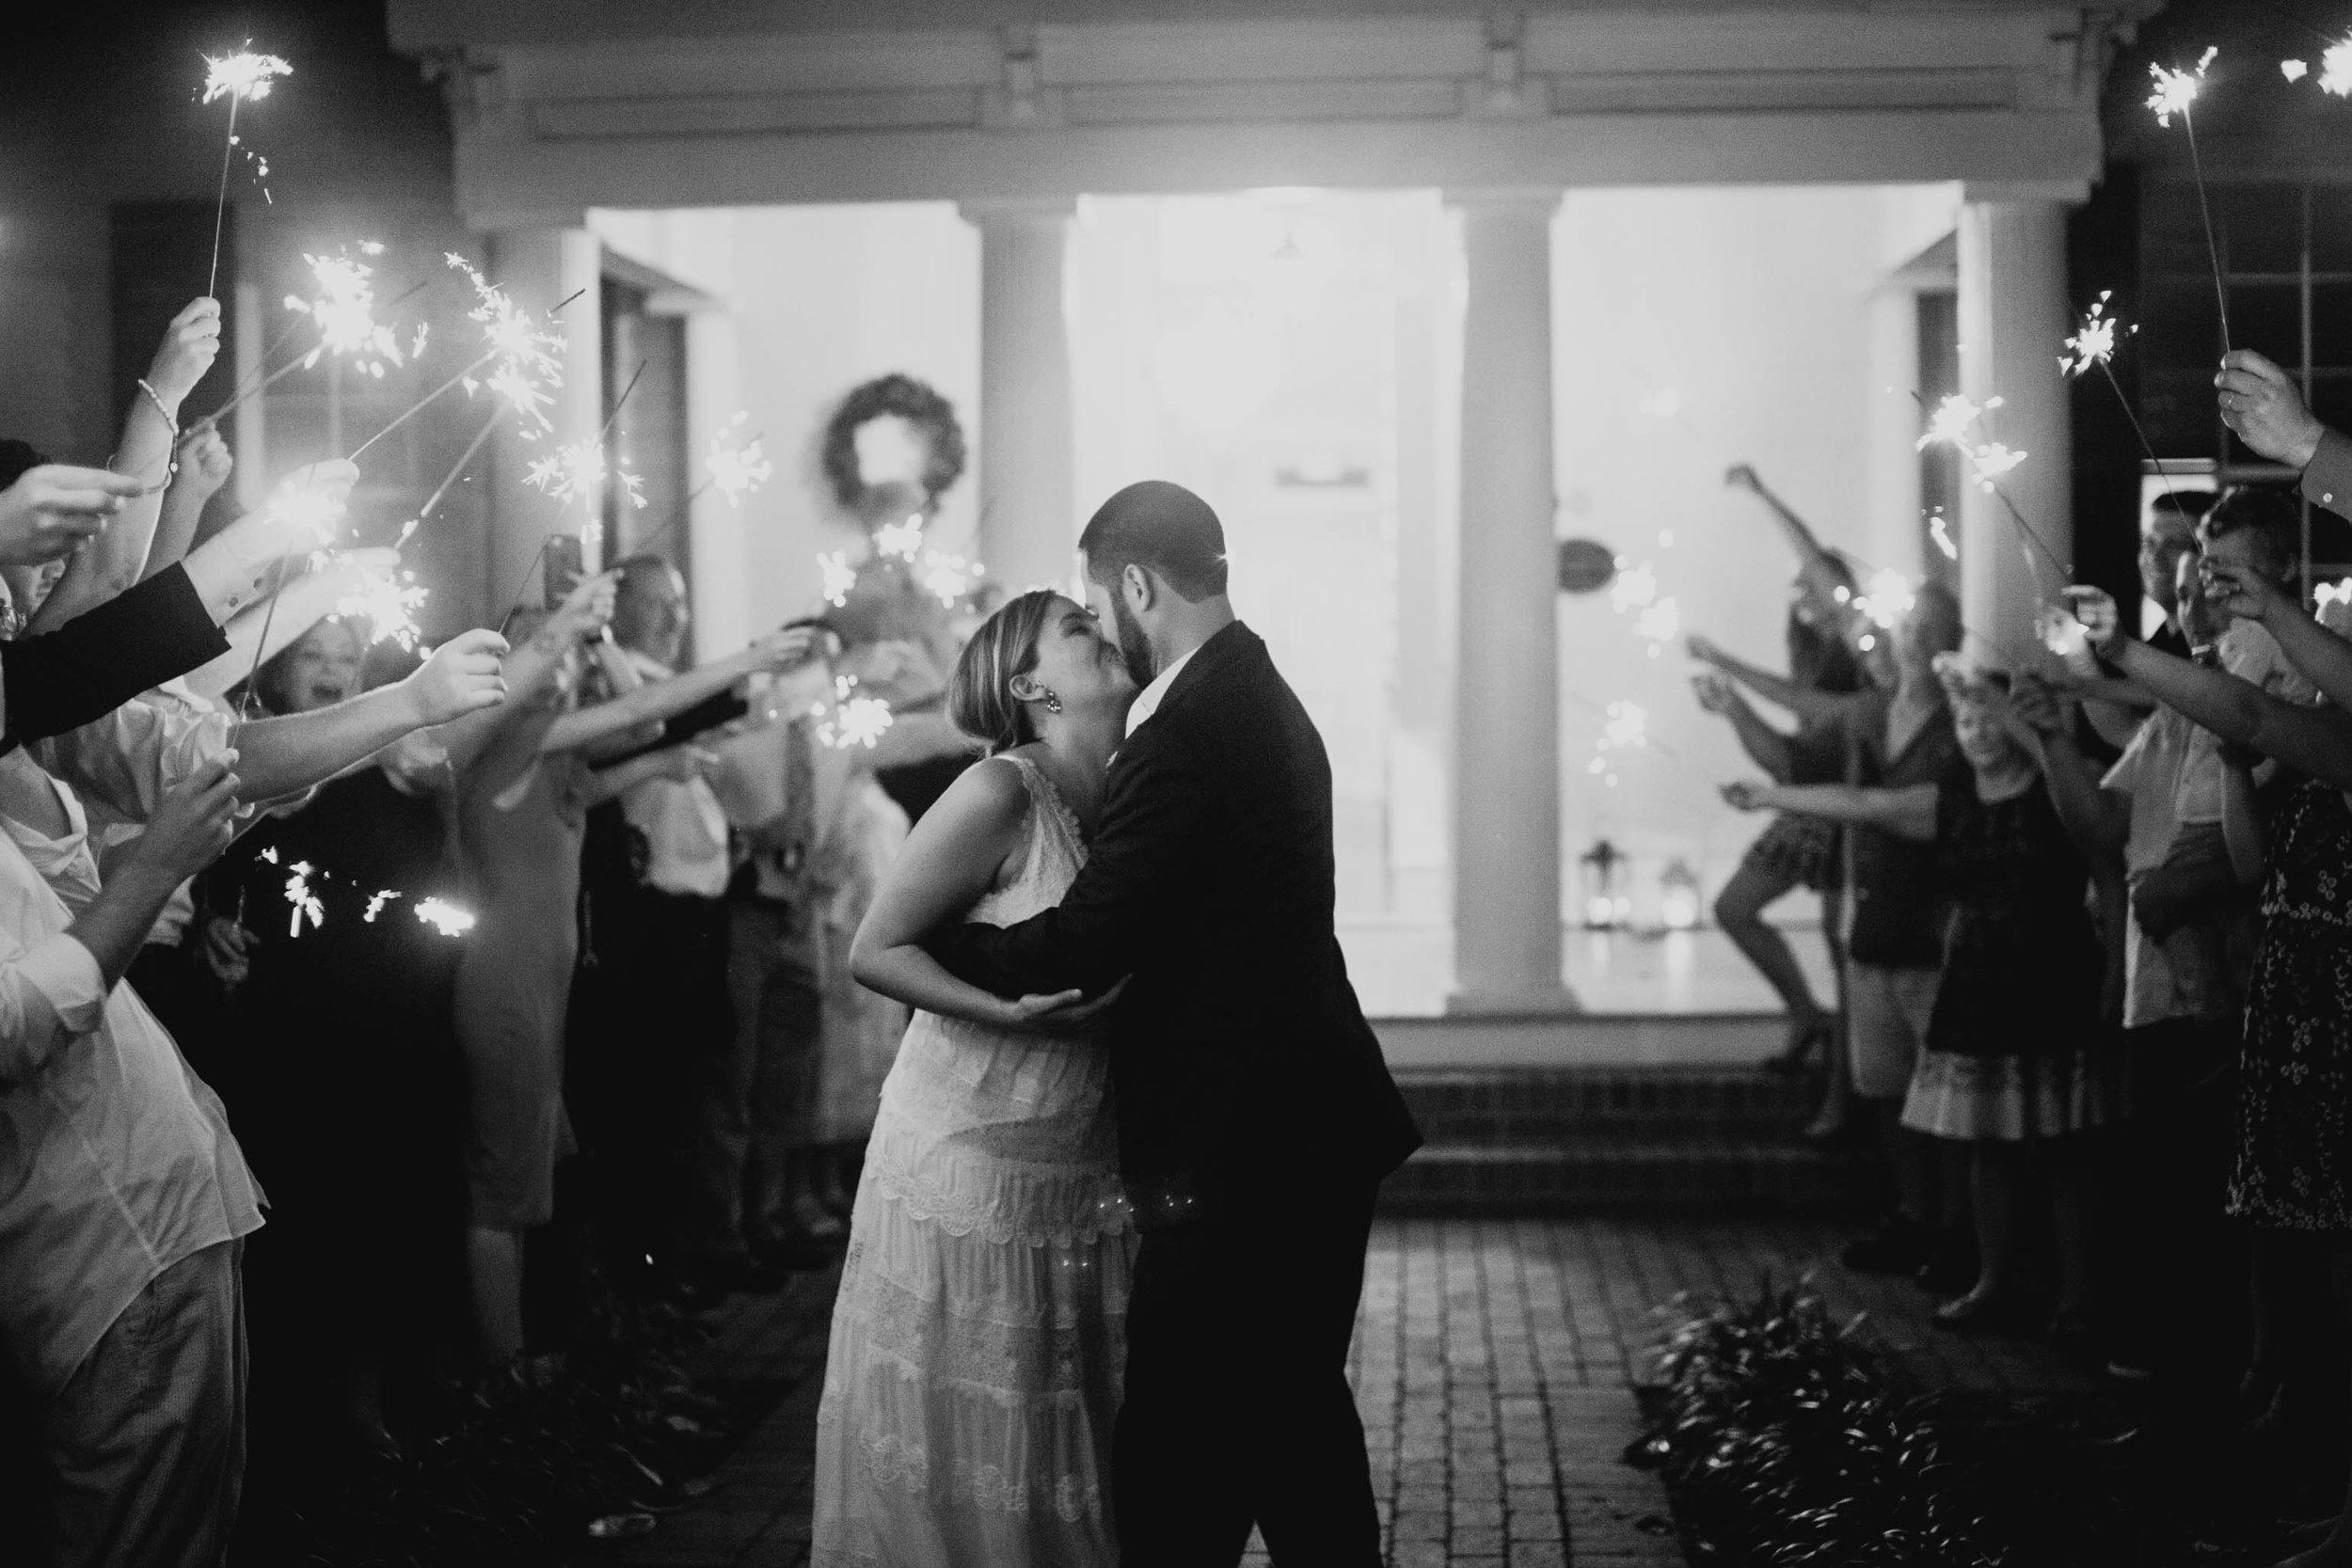 mims-house-wedding-bride-and-groom-kiss-photo.jpg